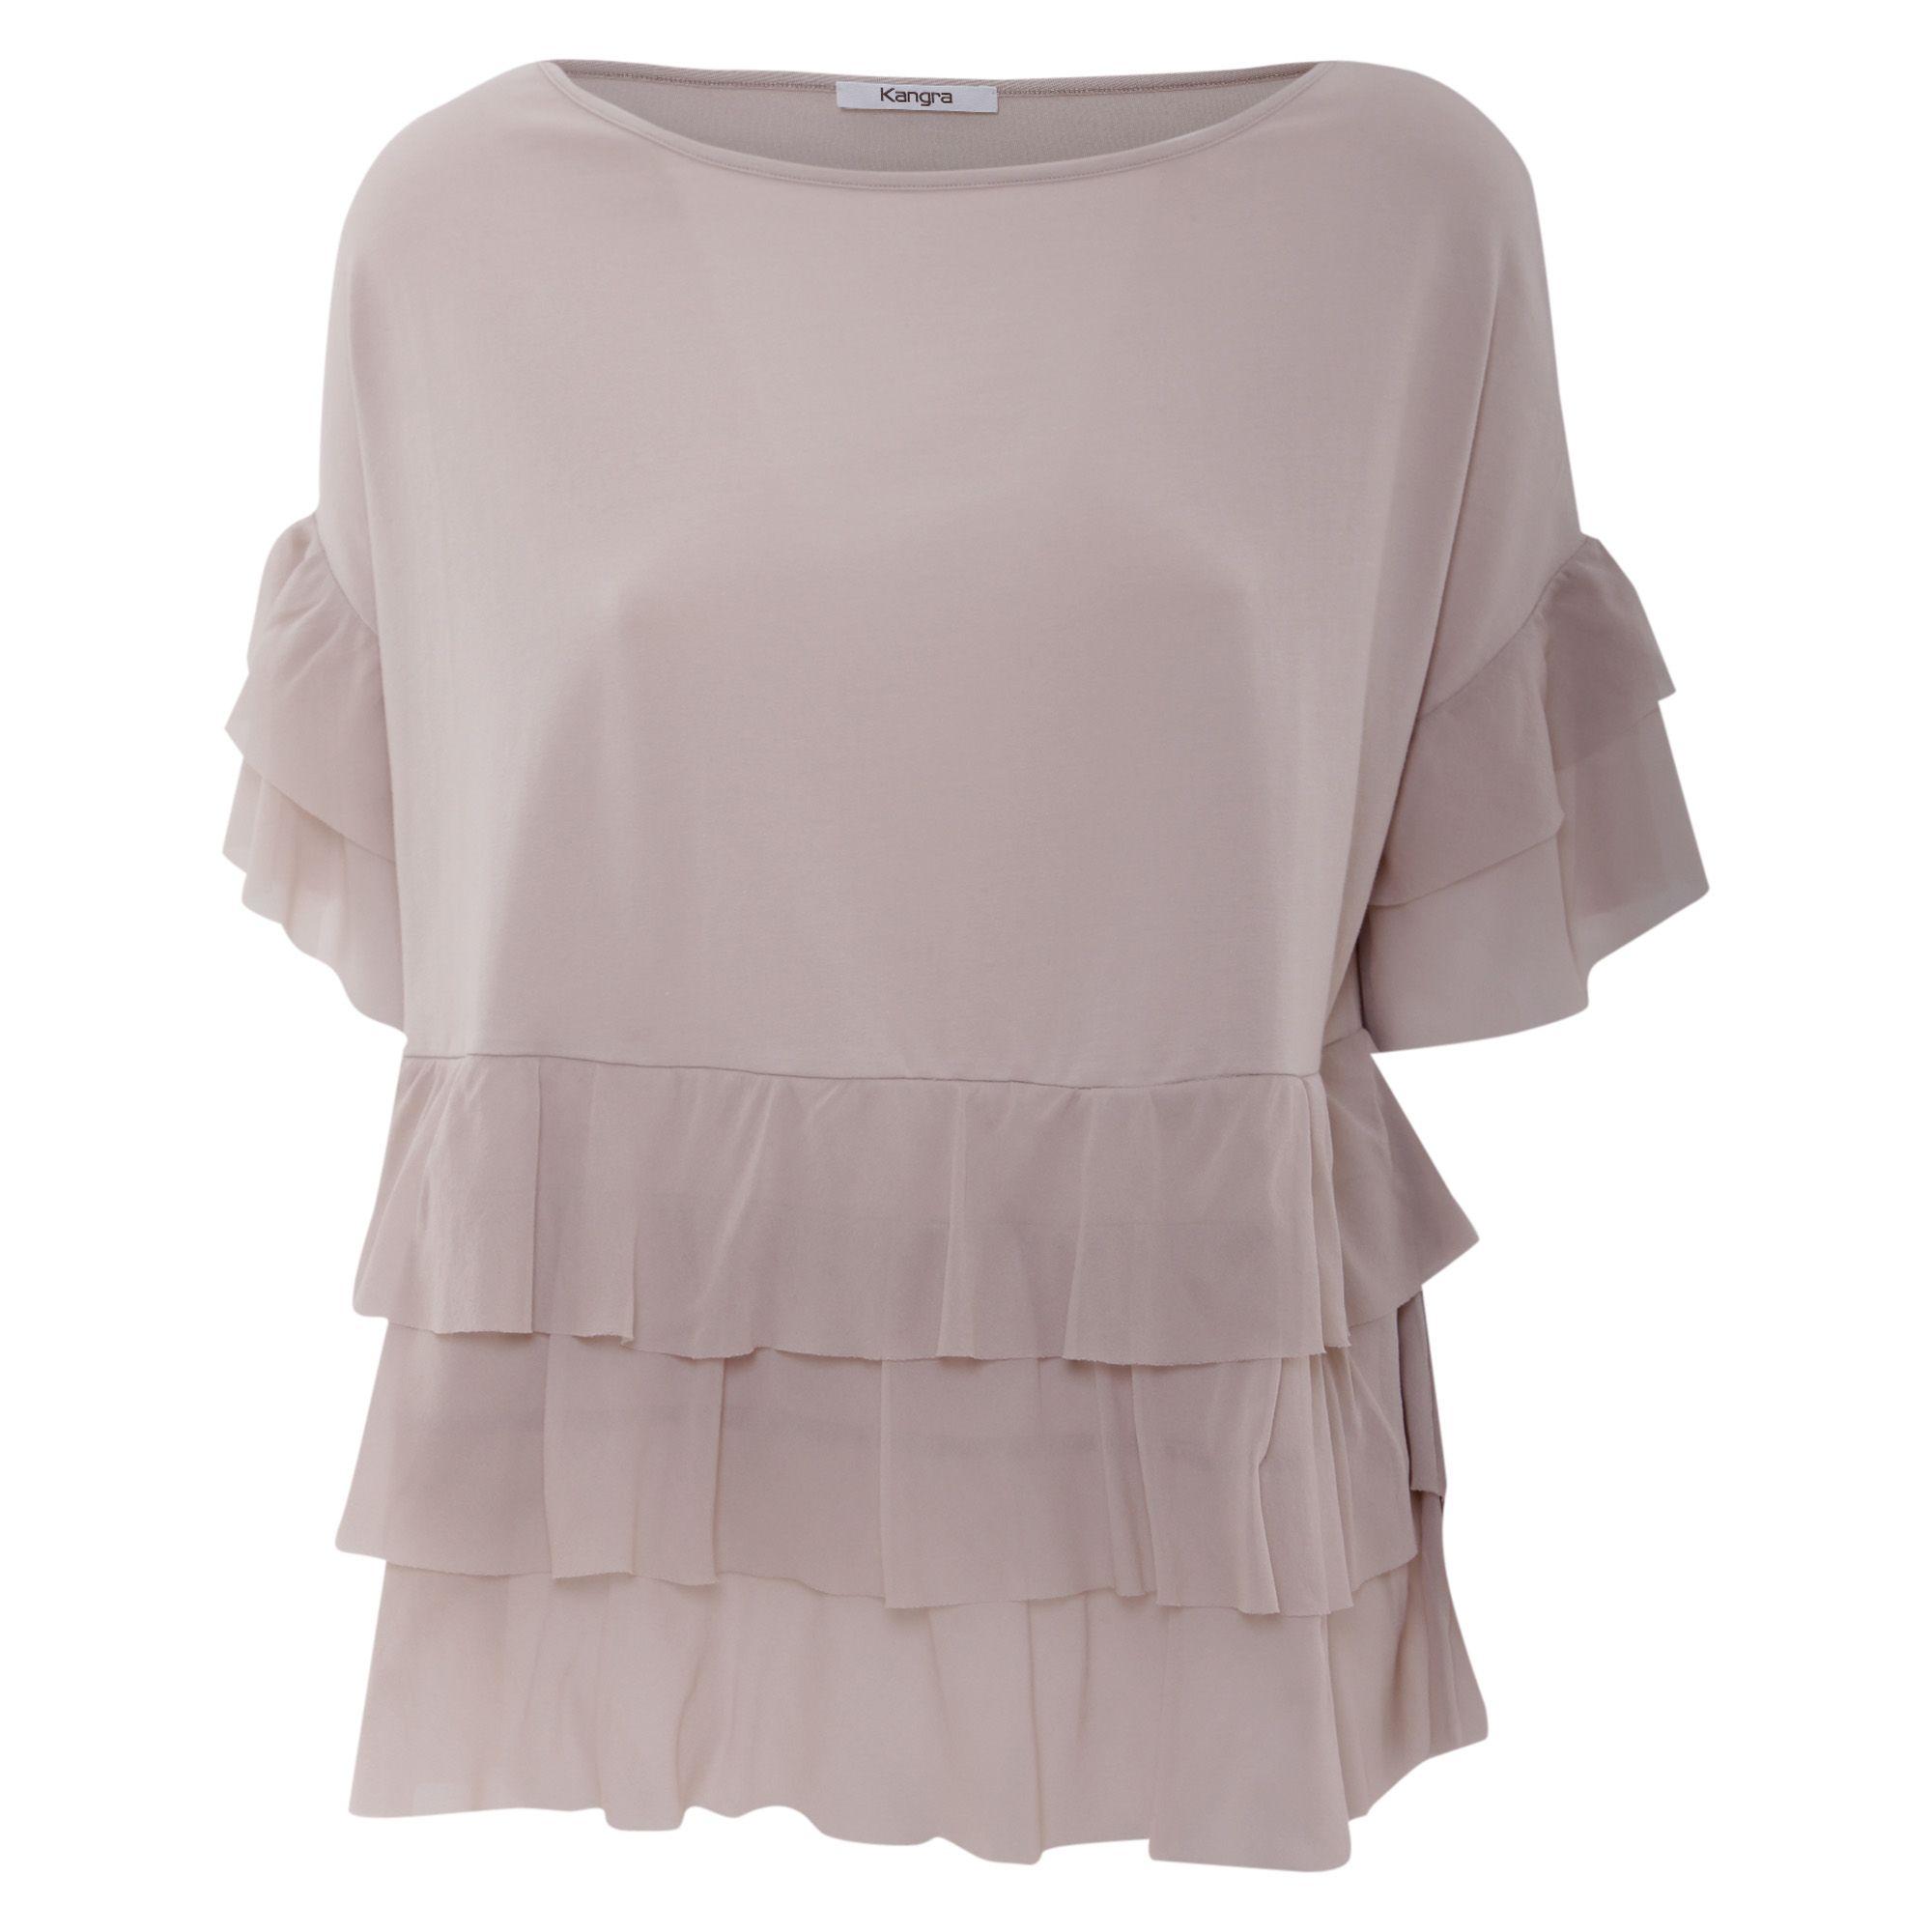 Kangra Cashmere Cotton Blend Blouse